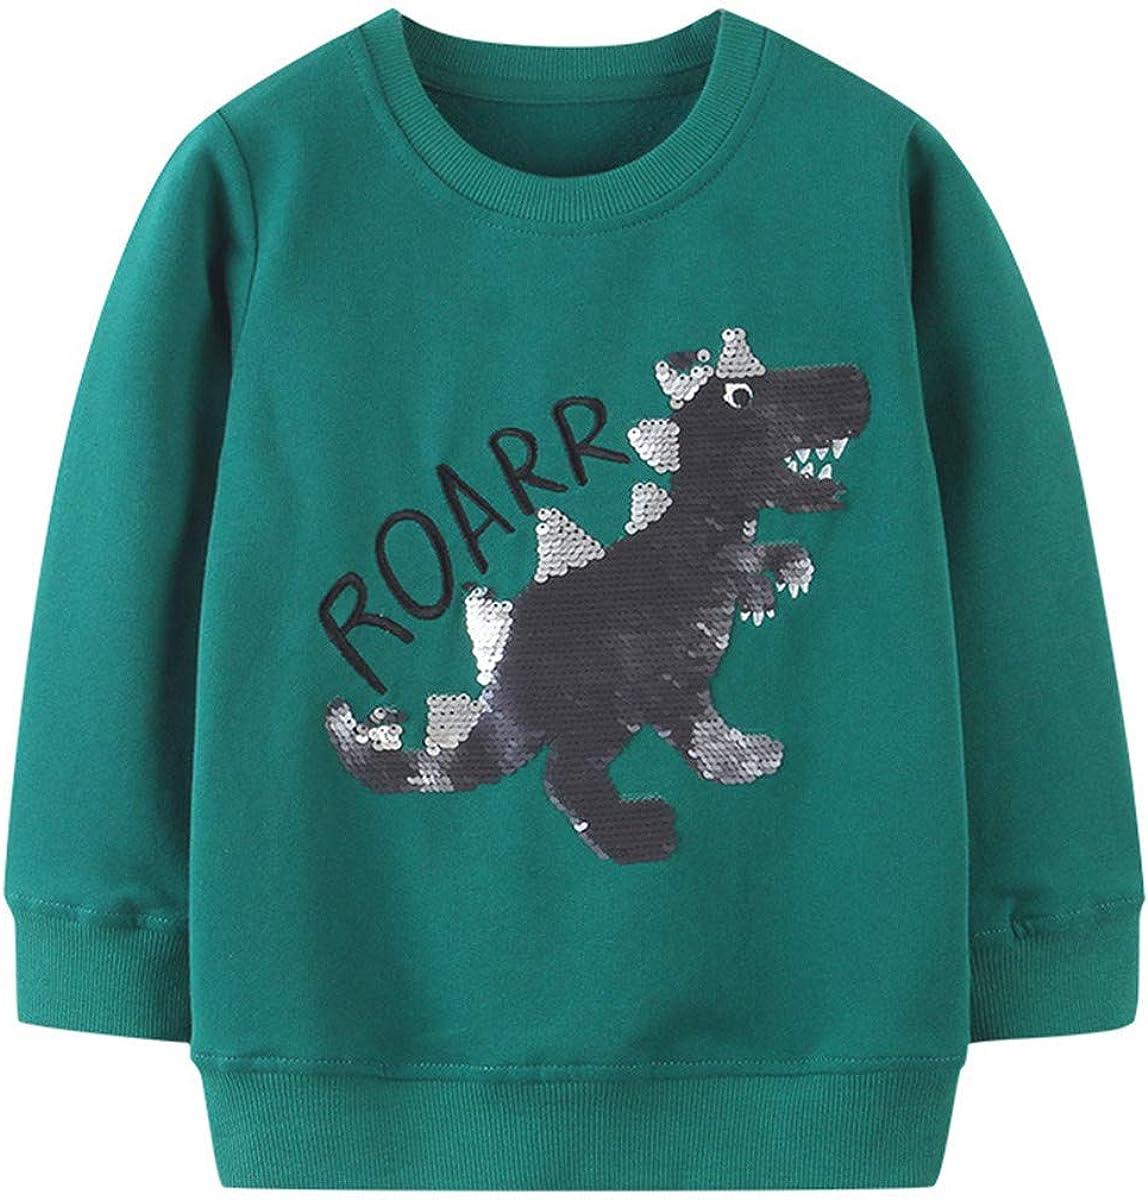 Baby Boys Girls Toddler Long Sleeve Cotton Crewneck Pullover Sweatshirt Christmas Cartoon Cute Top Shirt